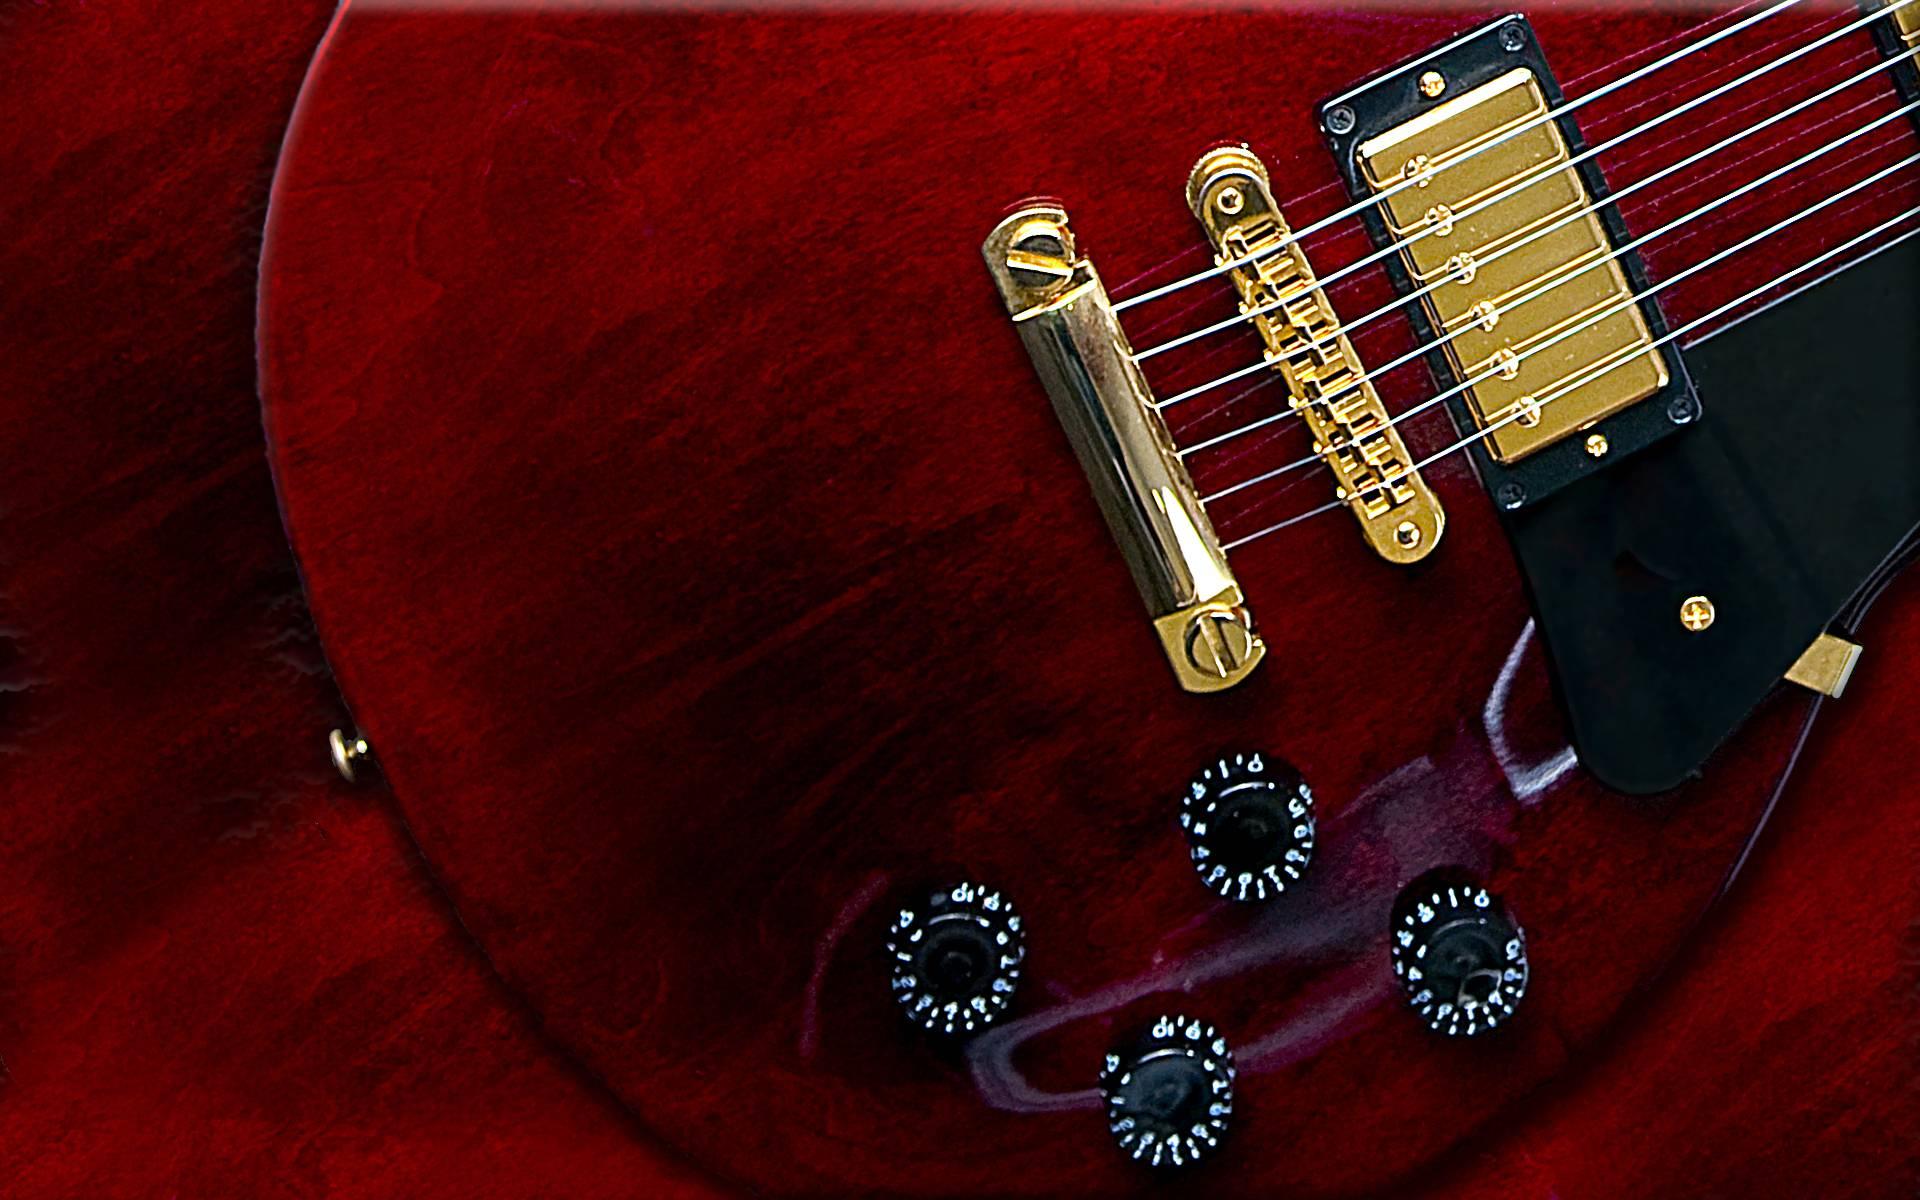 gibson guitar wallpaper - photo #15